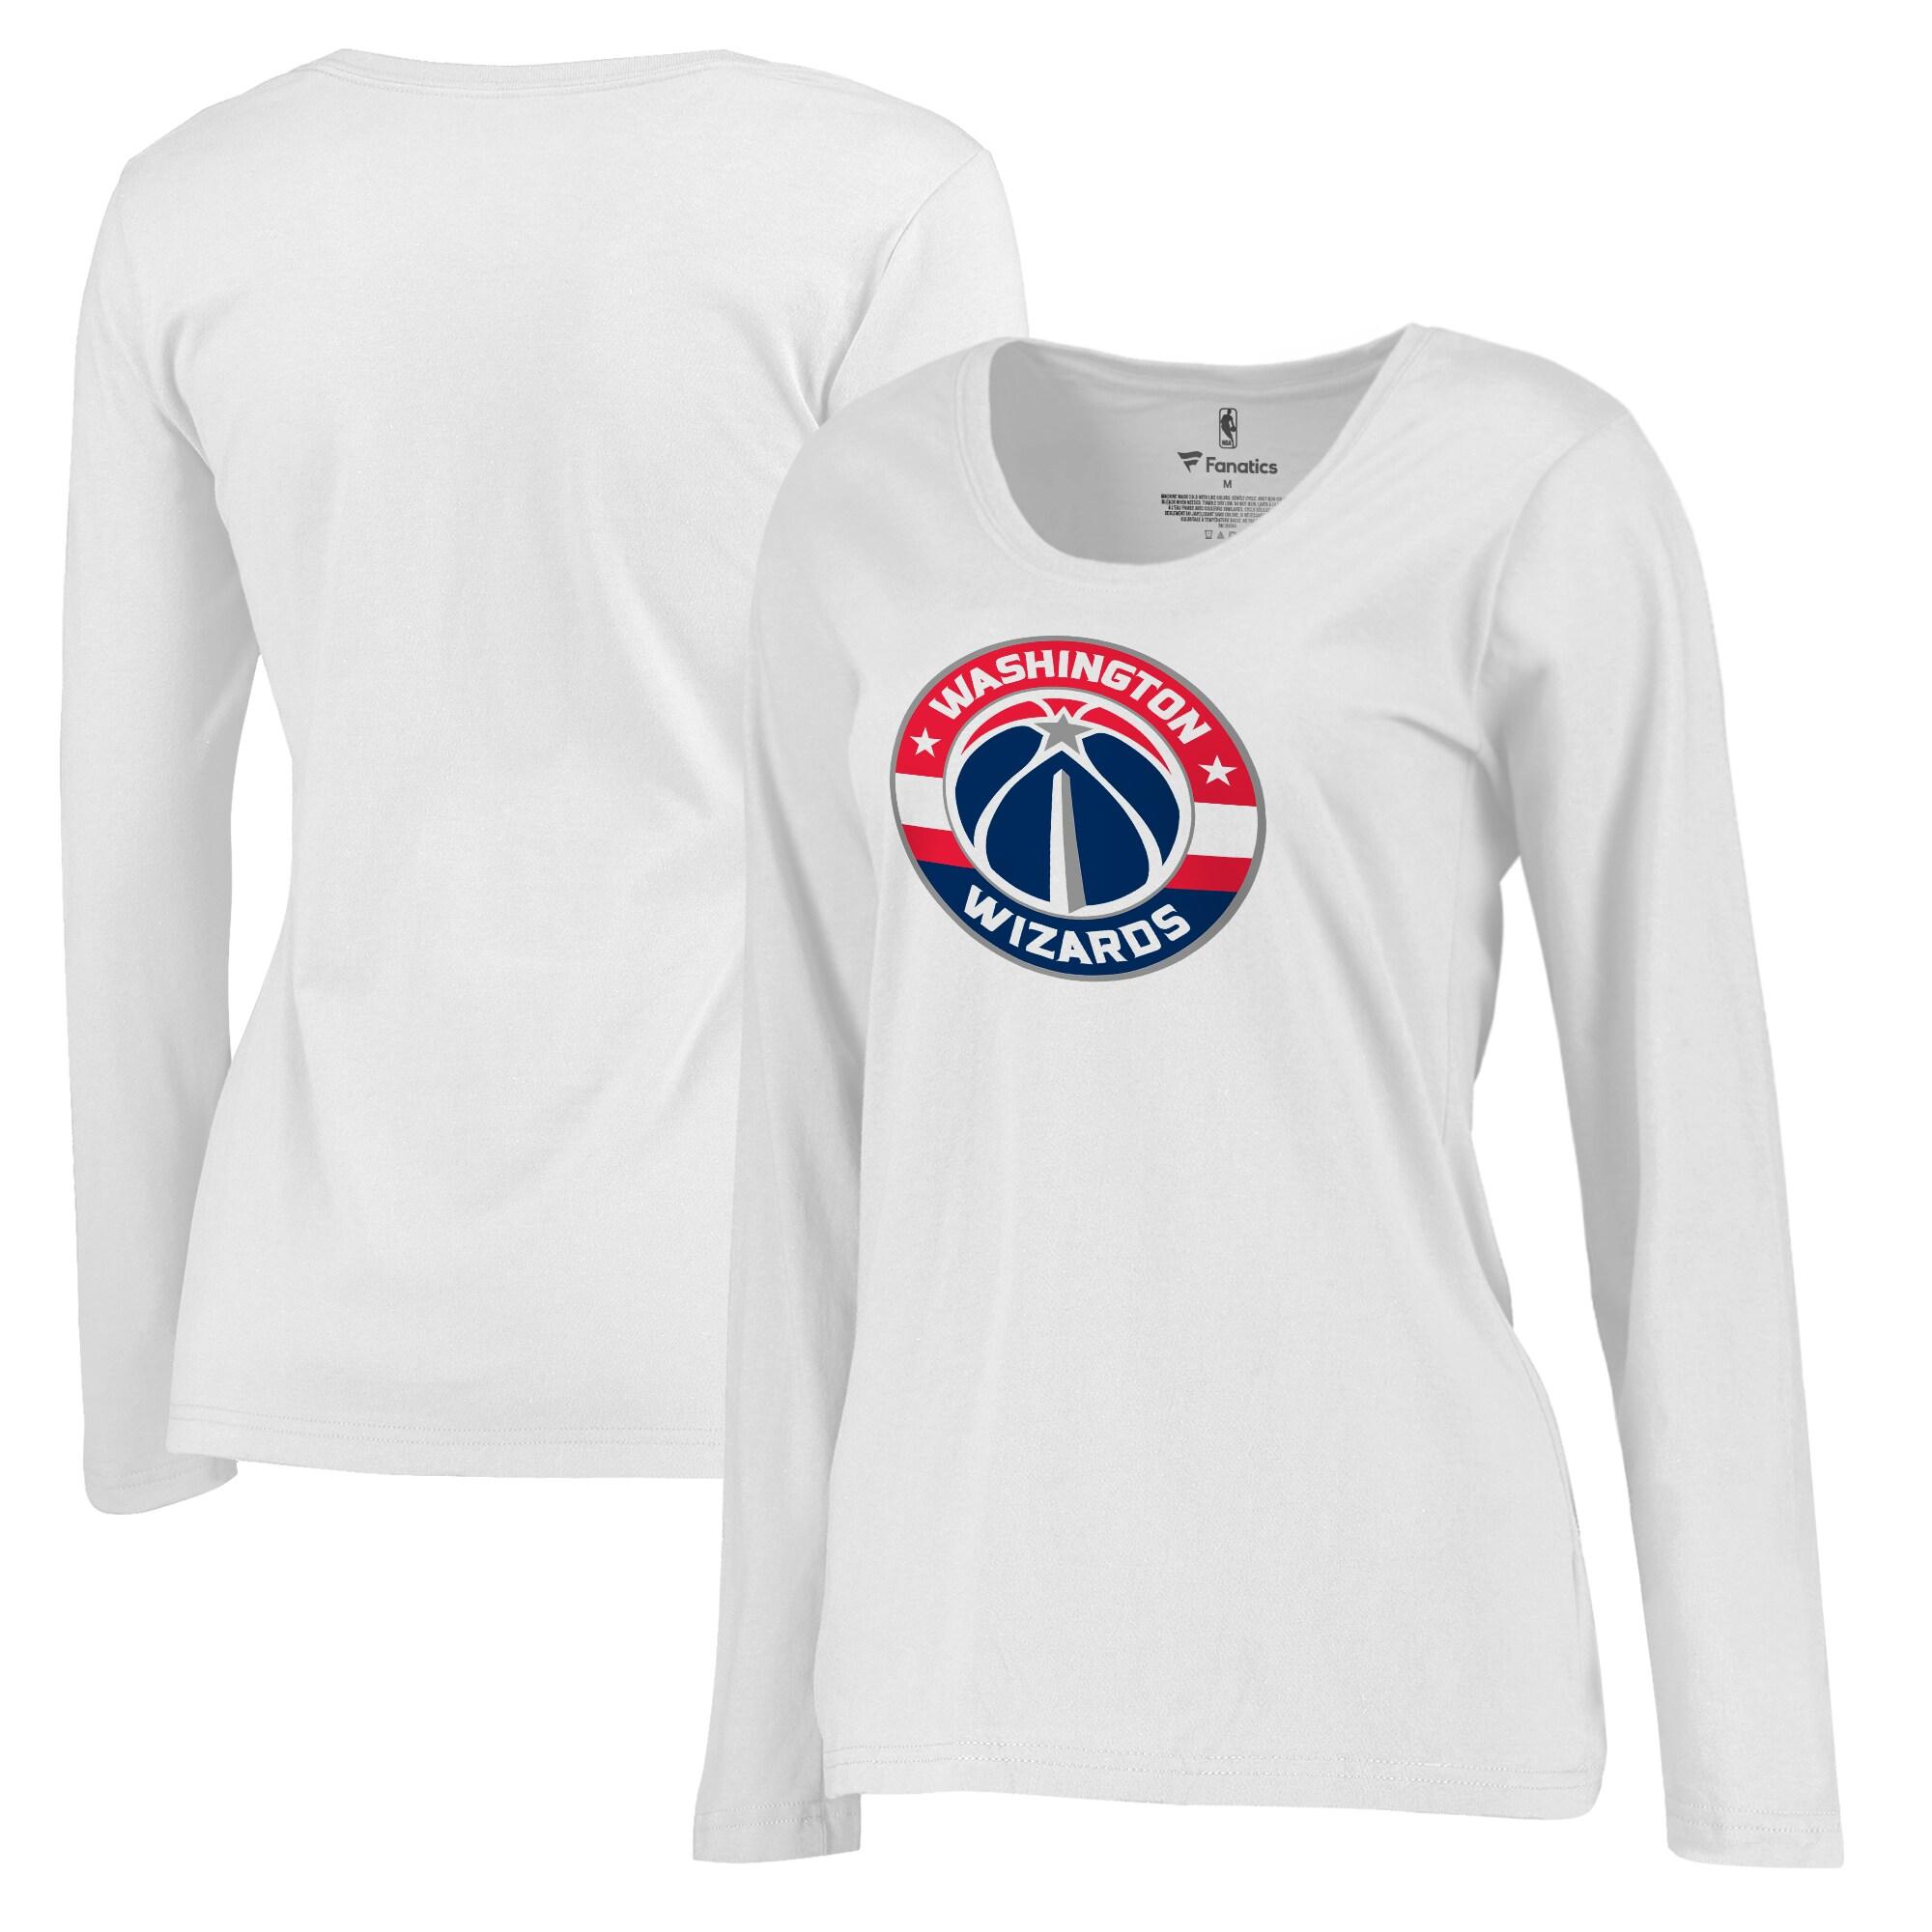 Washington Wizards Fanatics Branded Women's Plus Sizes Team Primary Logo Long Sleeve T-Shirt - White